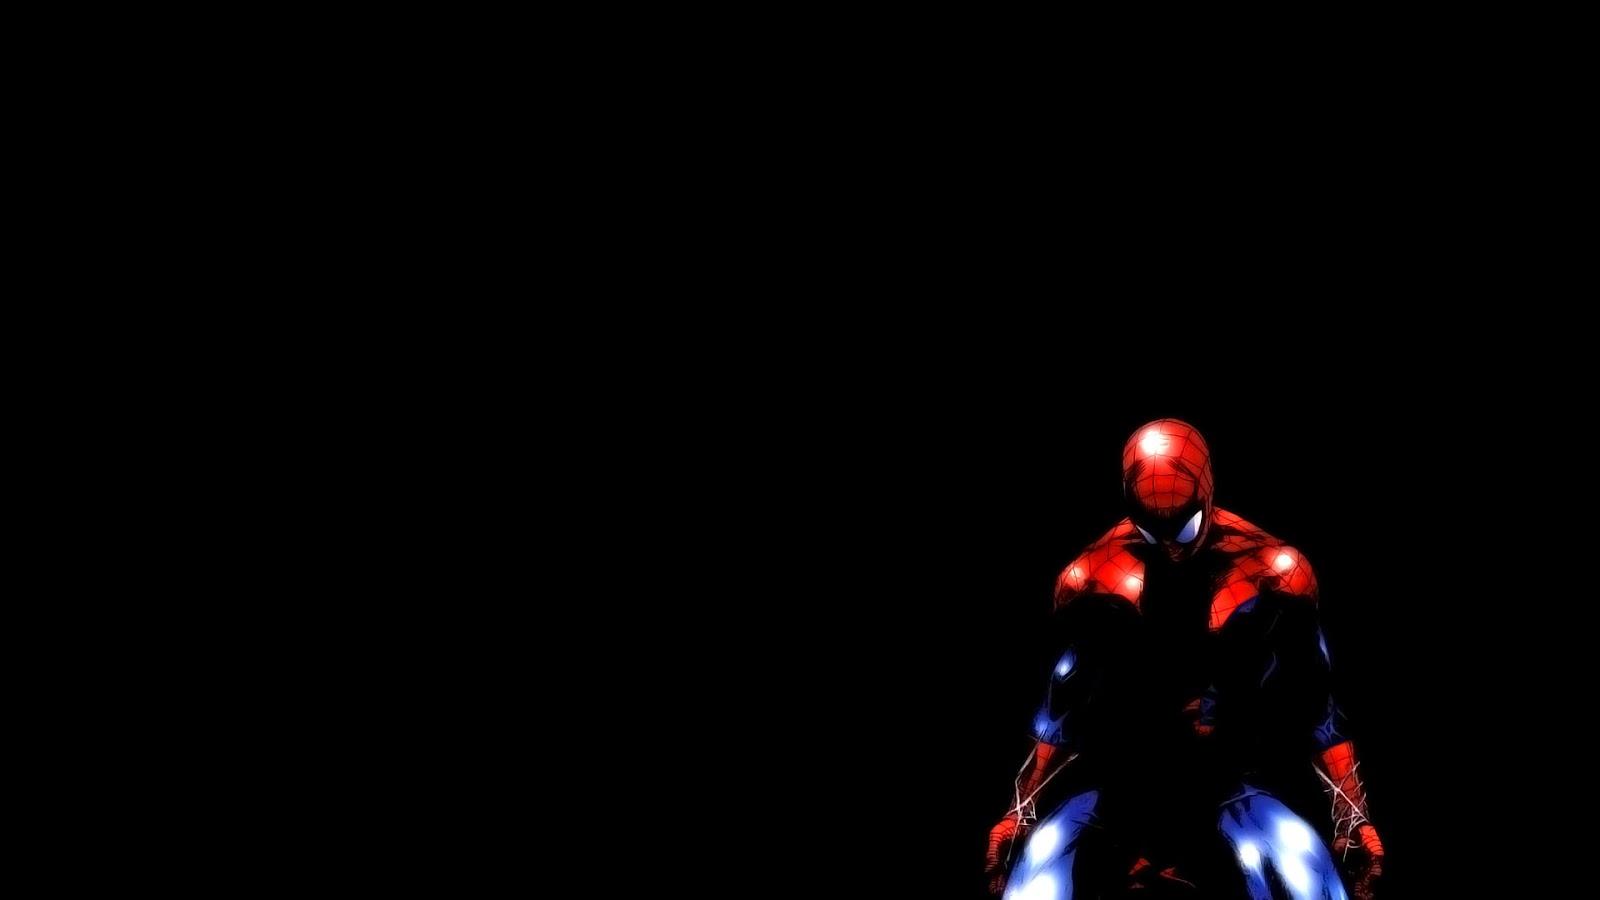 Wallpaper HD 1080p Spiderman Movie Comics